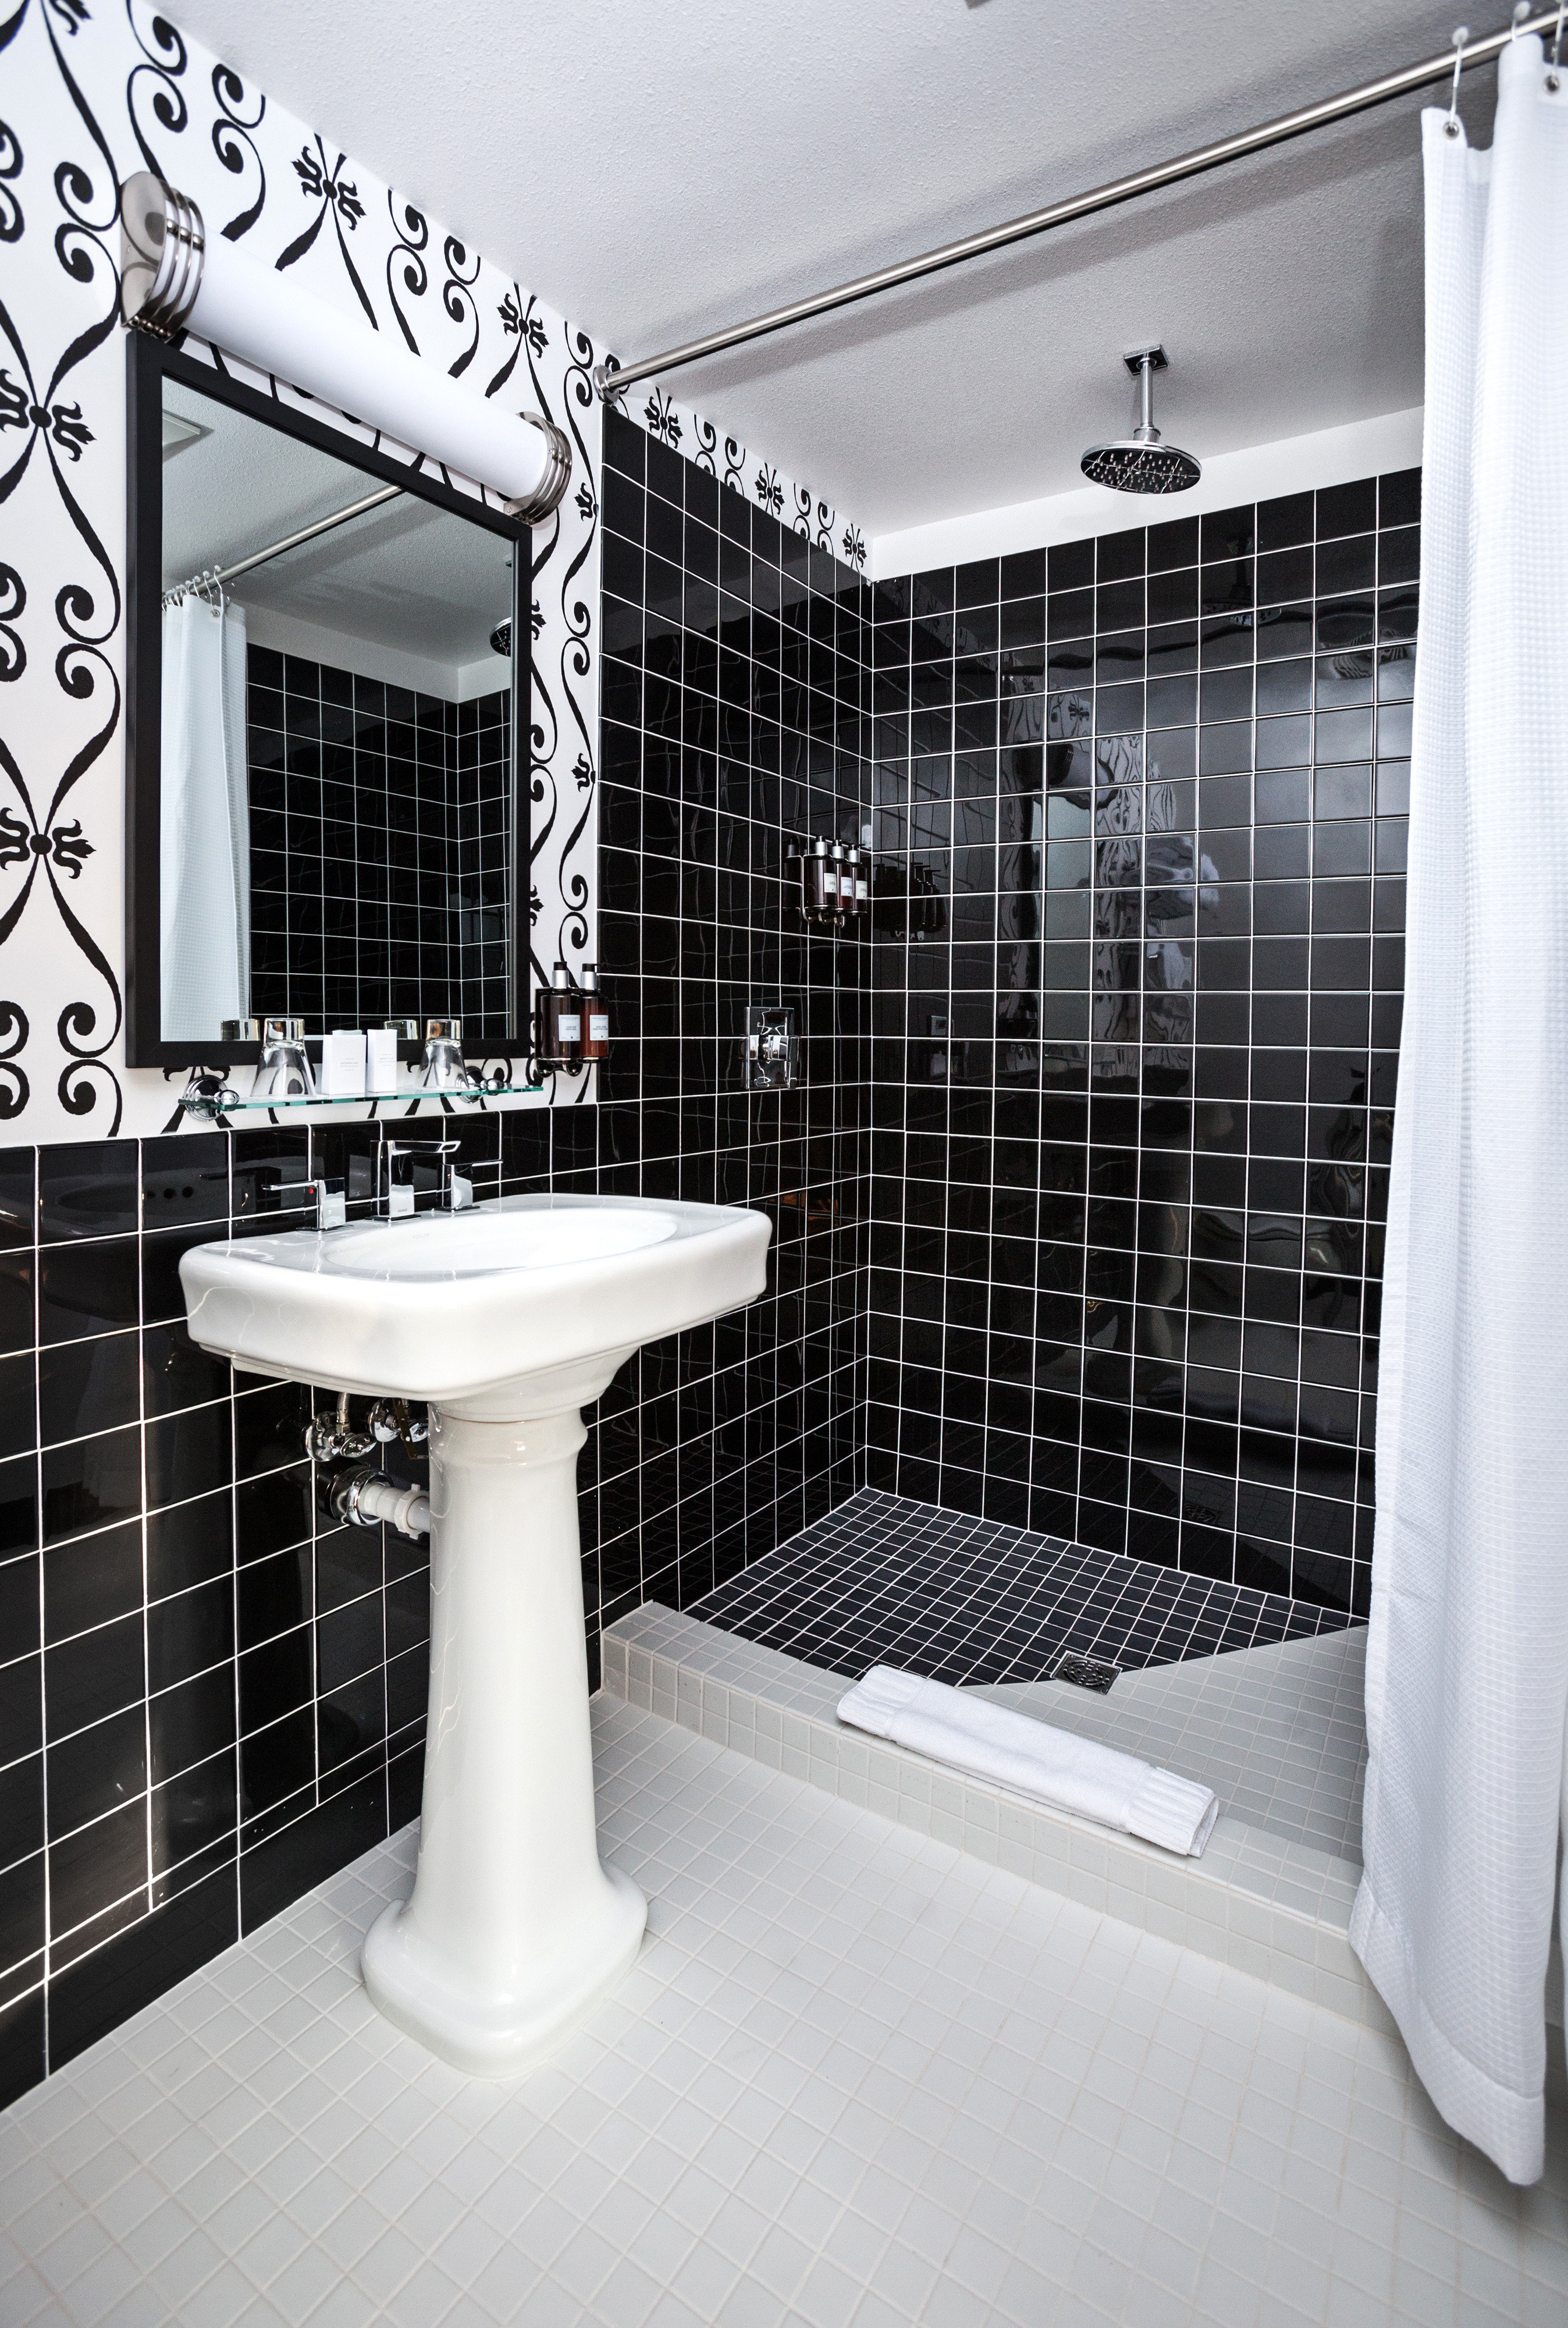 Bath Modern bathroom white plumbing fixture black tile tiled bathtub flooring bidet toilet tub